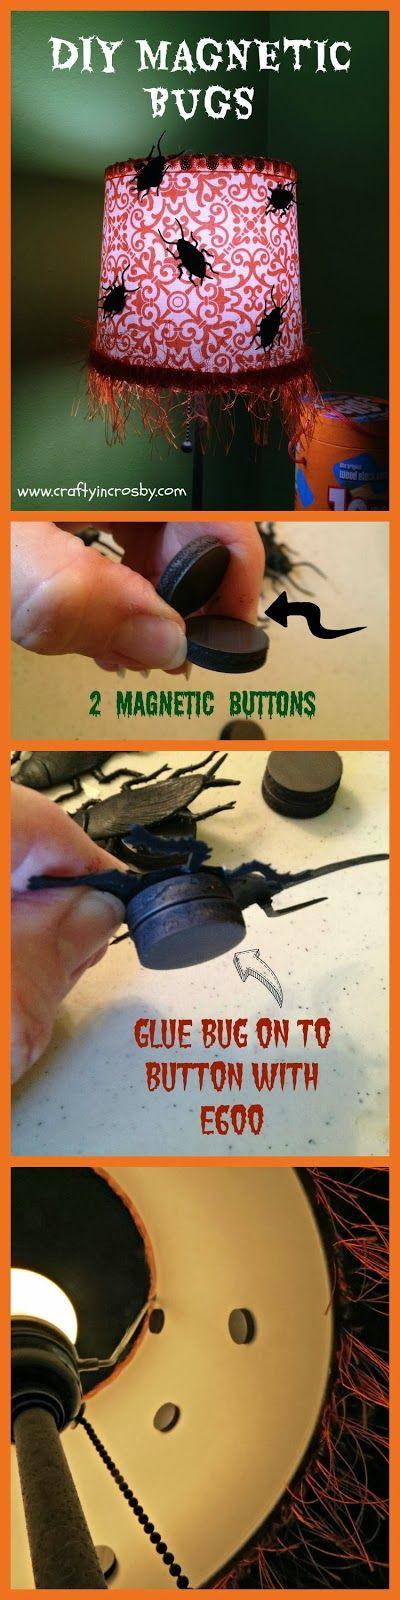 DIY Magnetic Bugs - Creepy Crawlers for Halloween!